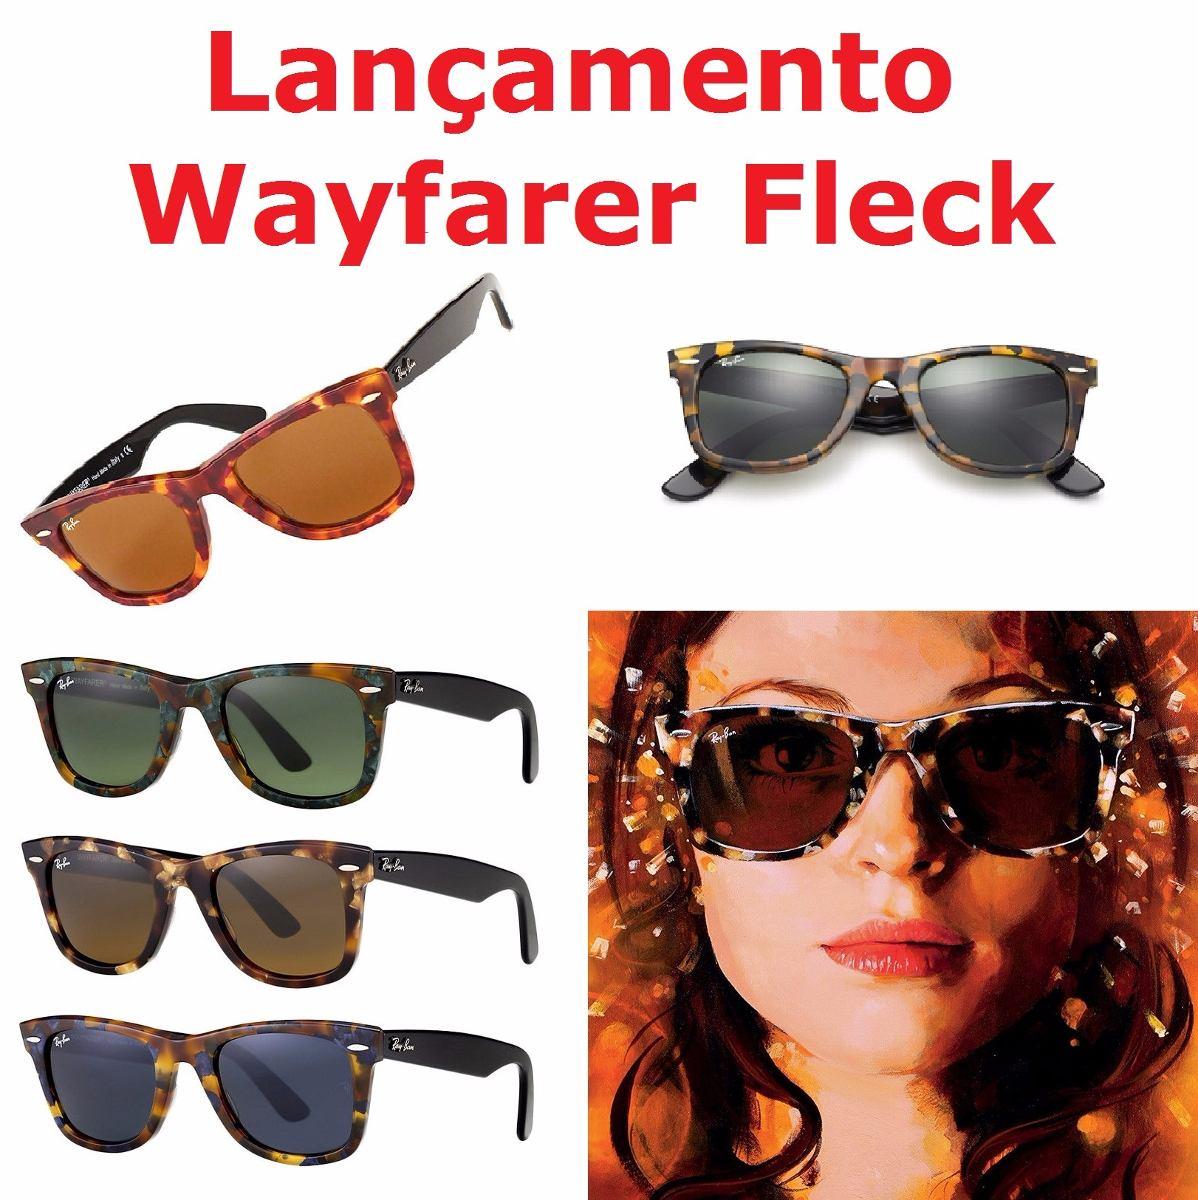 Ray Ban Wayfarer 2140 Mercado Livre « Heritage Malta 9e3ef858d3